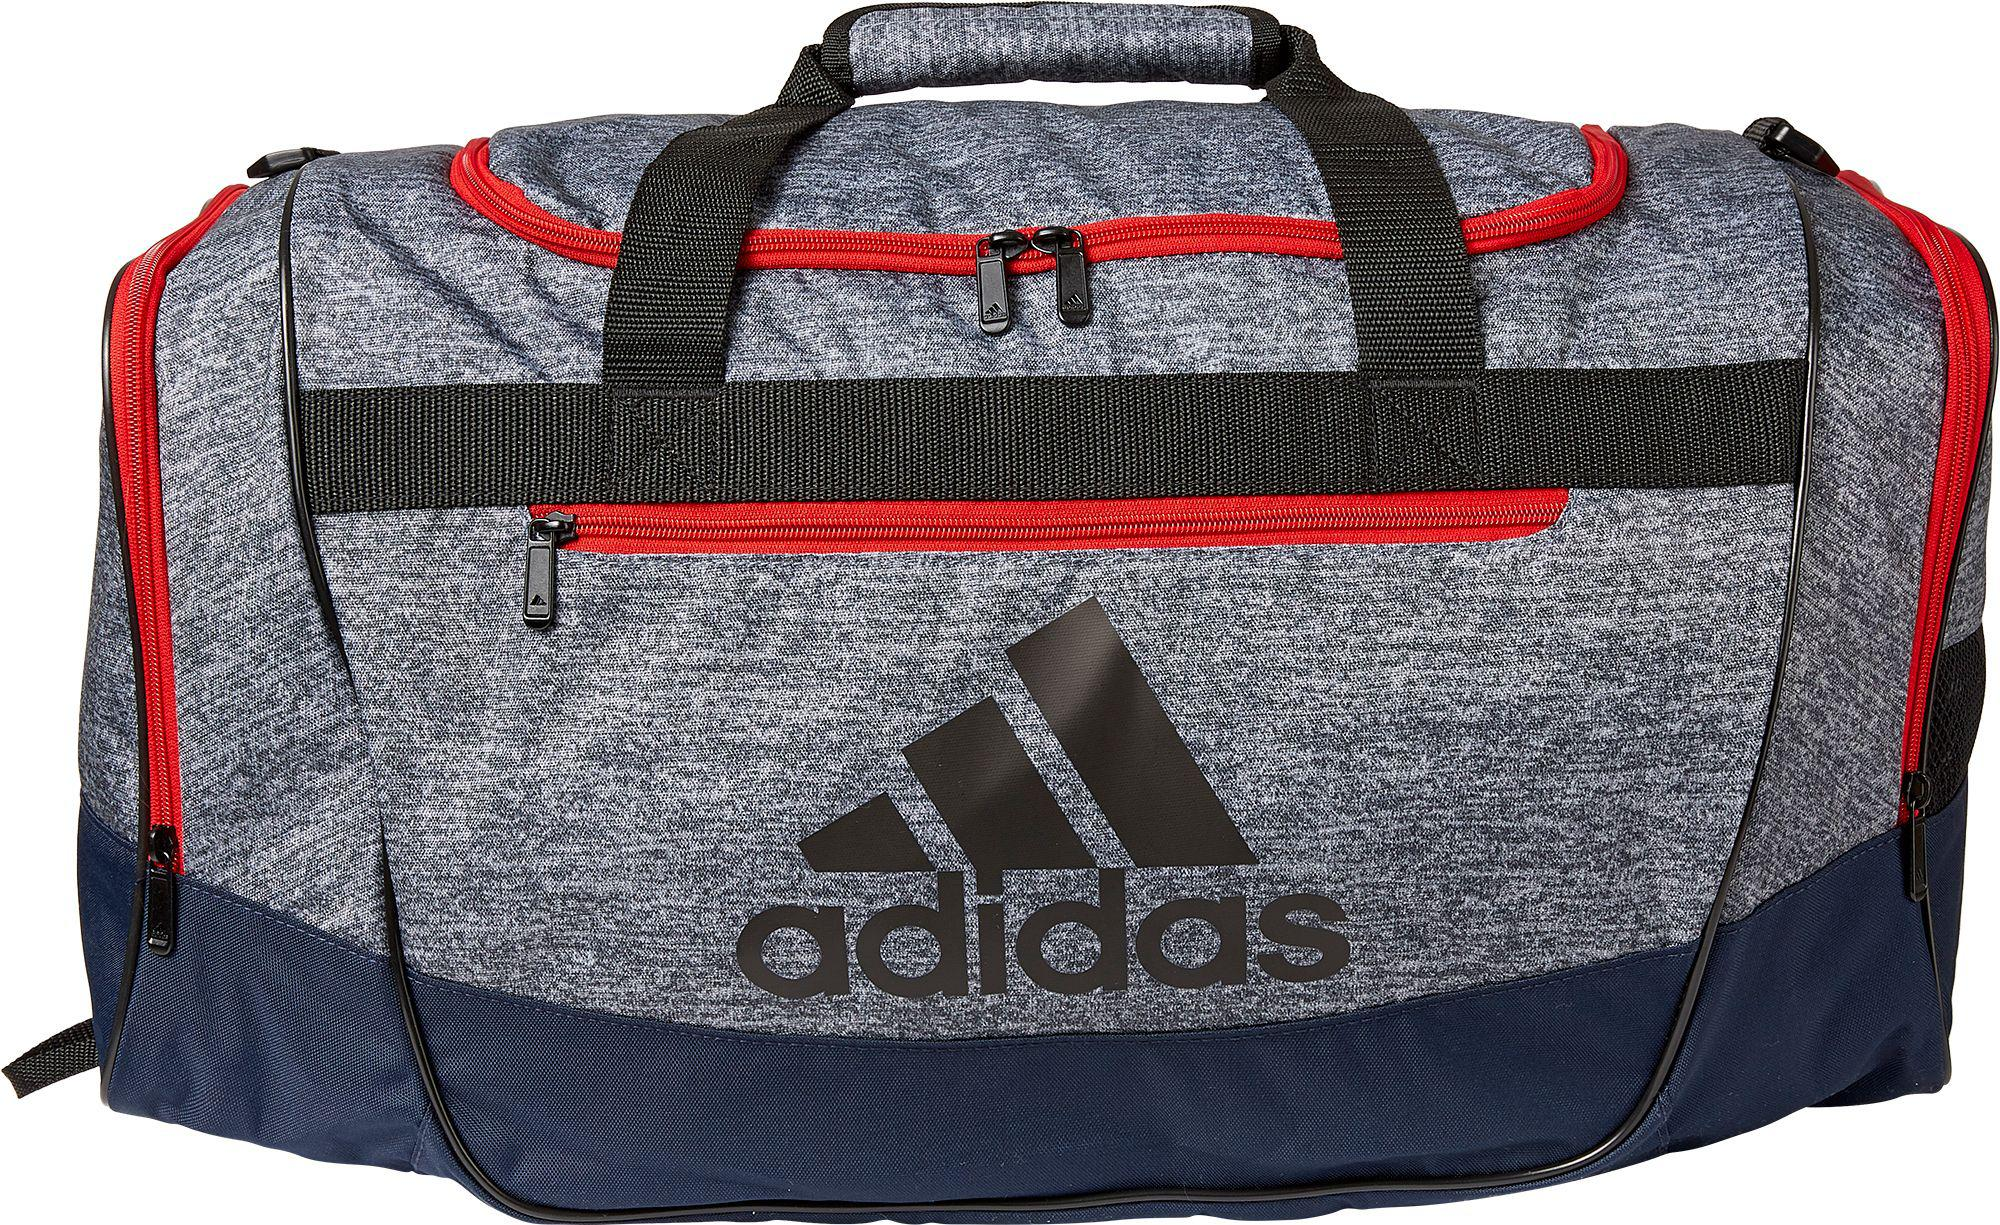 c1bbb1bd389f ... Defender Iii Medium Duffle Bag for Men - Lyst. View fullscreen